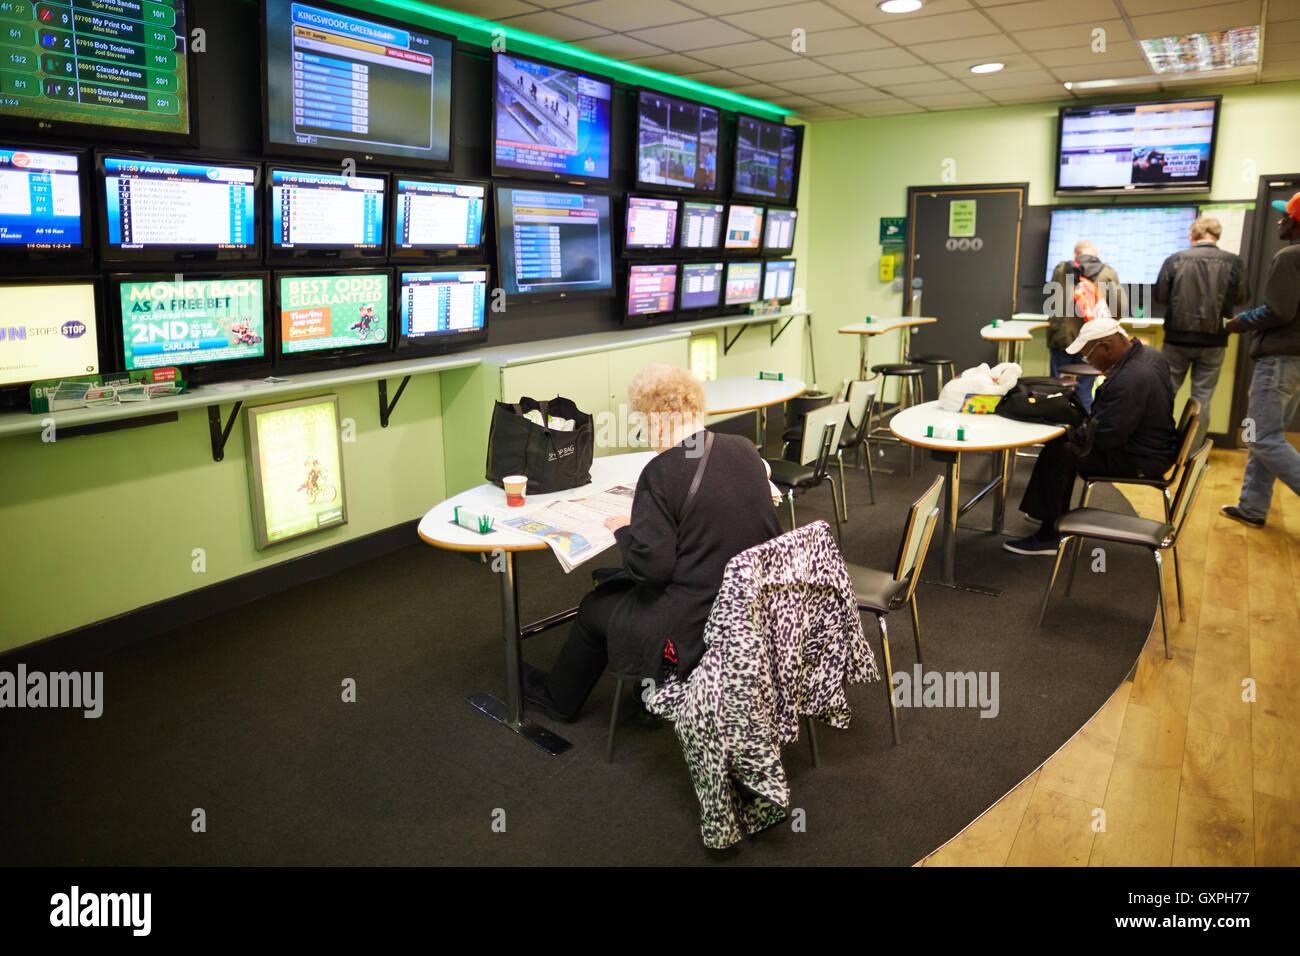 Gambling shop procter & gamble inc canada